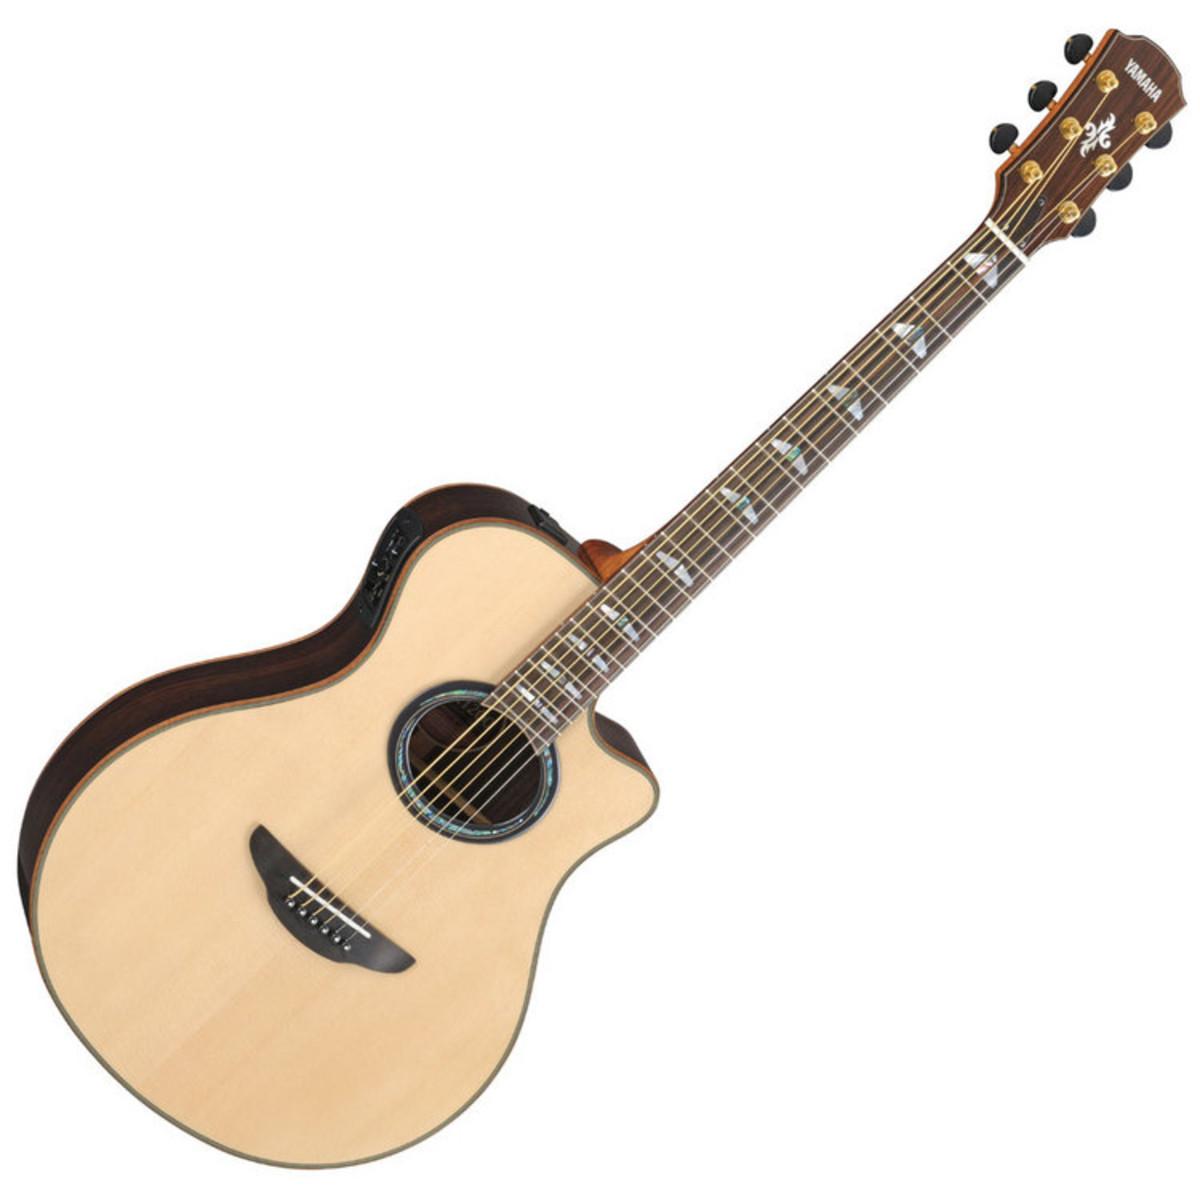 yamaha apx1200 elektro akustik gitarre natur bei gear4music. Black Bedroom Furniture Sets. Home Design Ideas